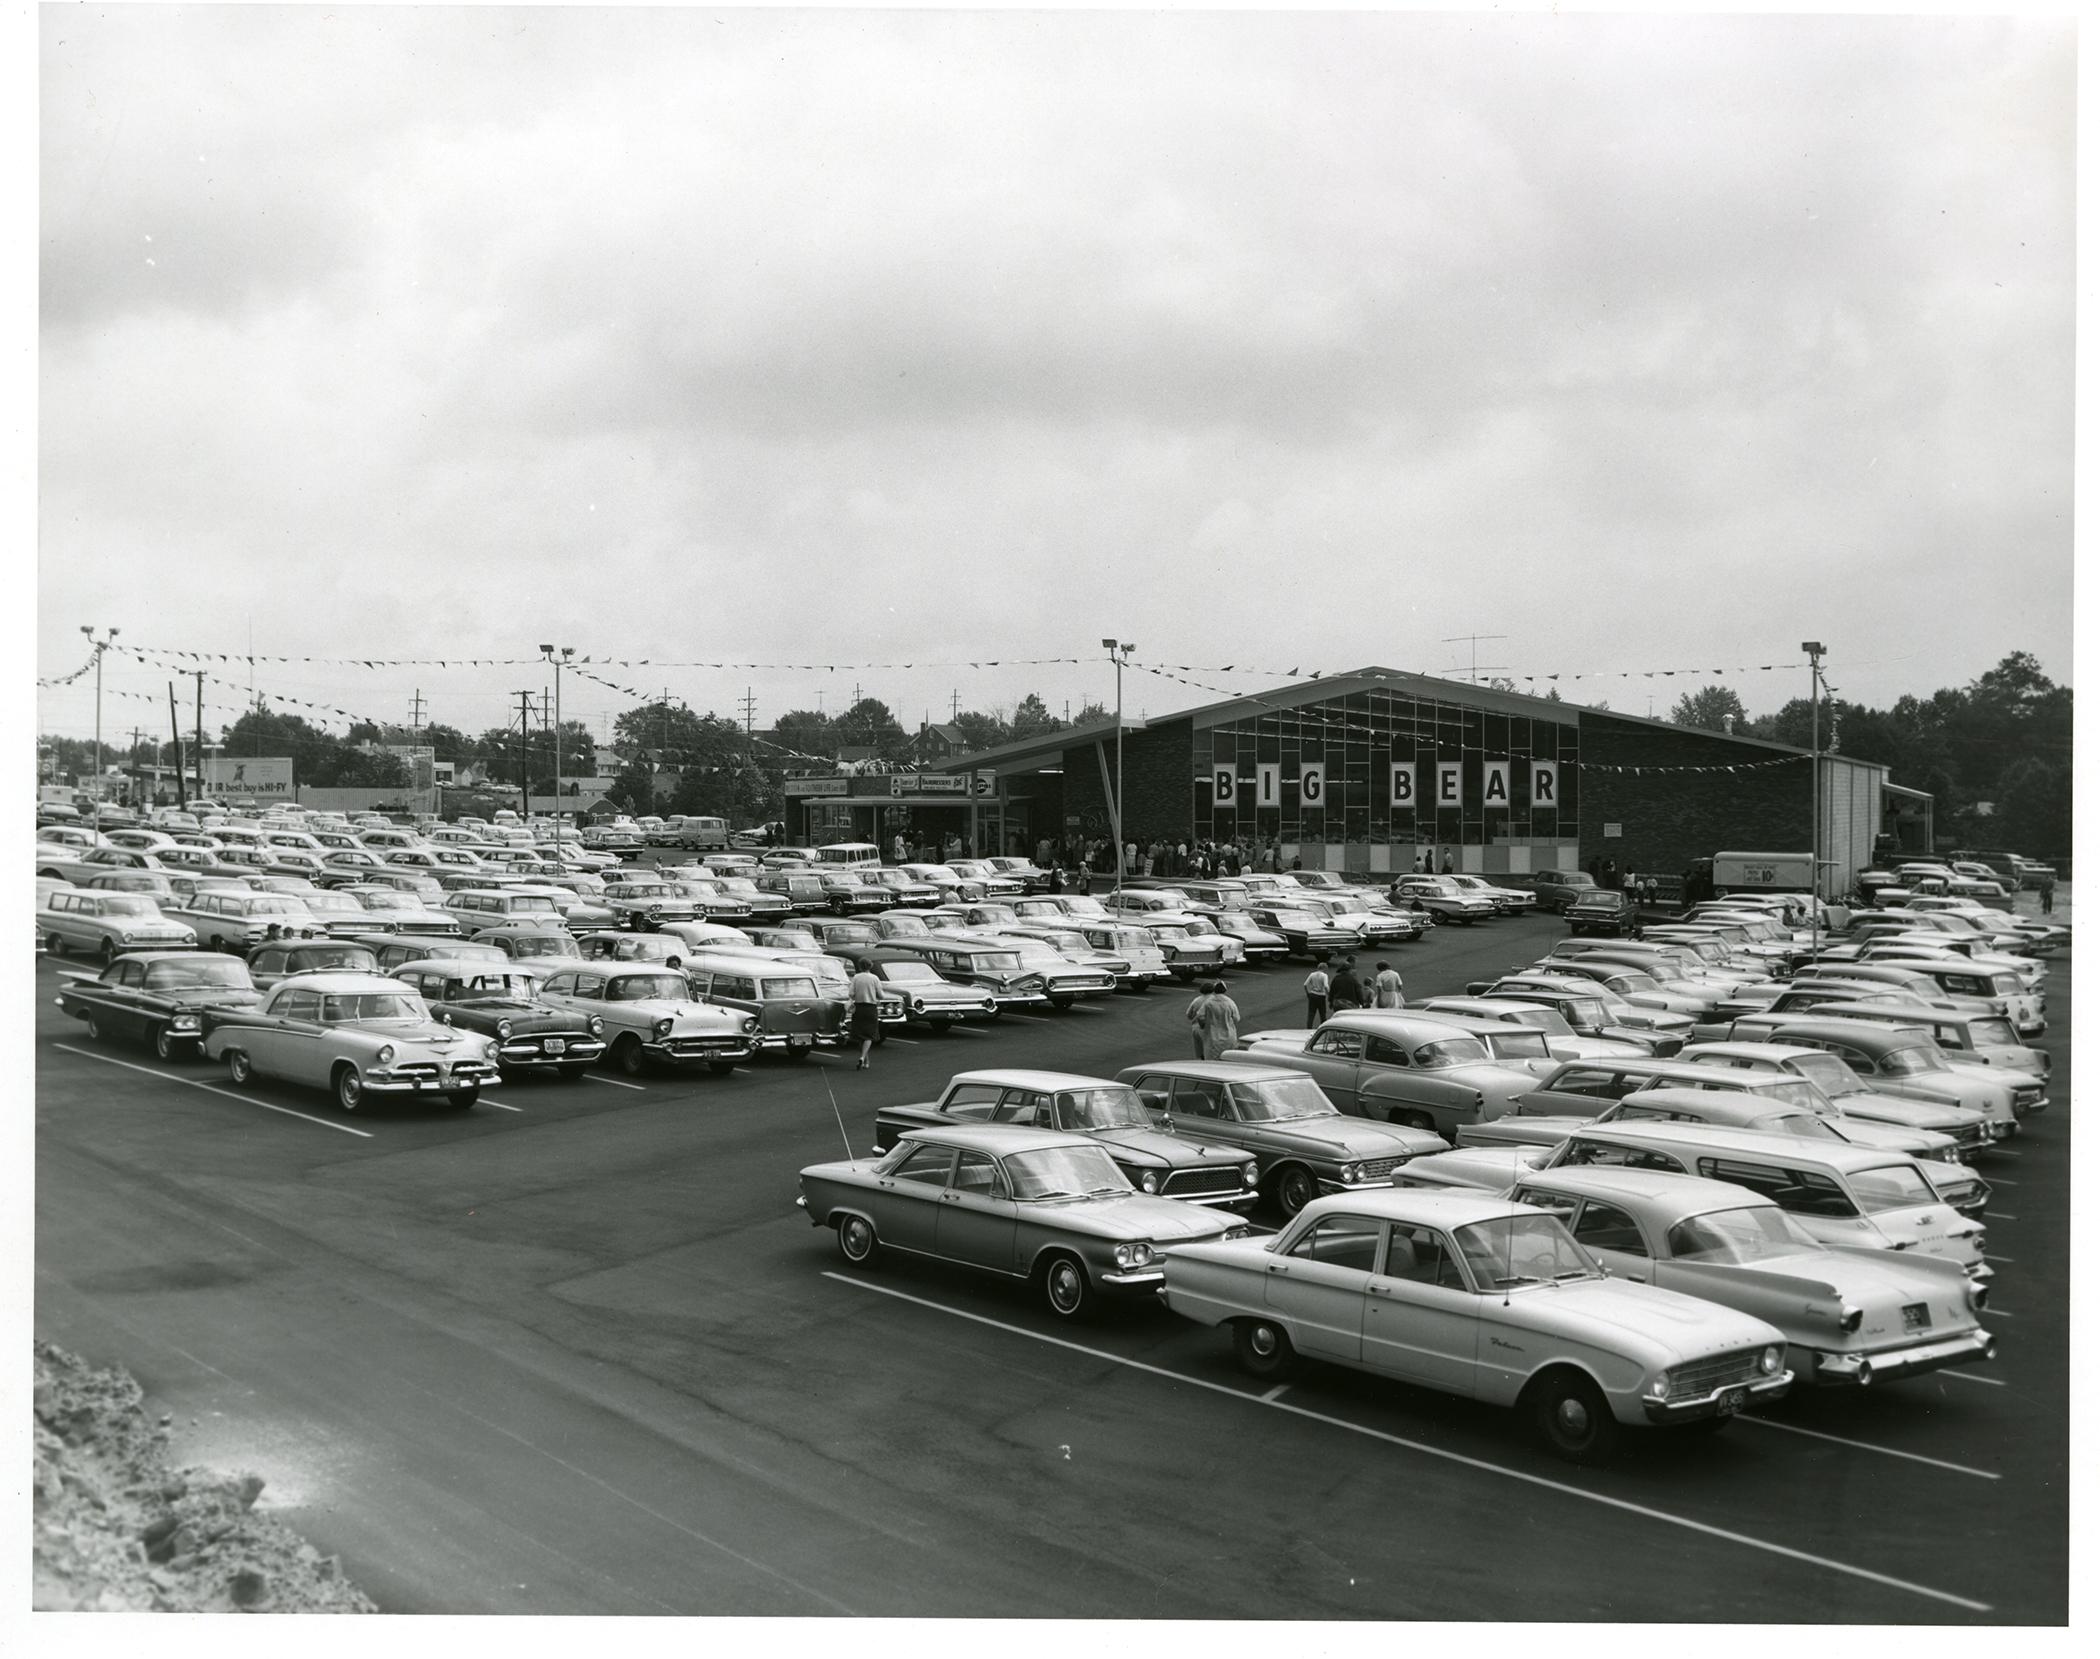 bb-650-ashland-road-8-12-1964-1